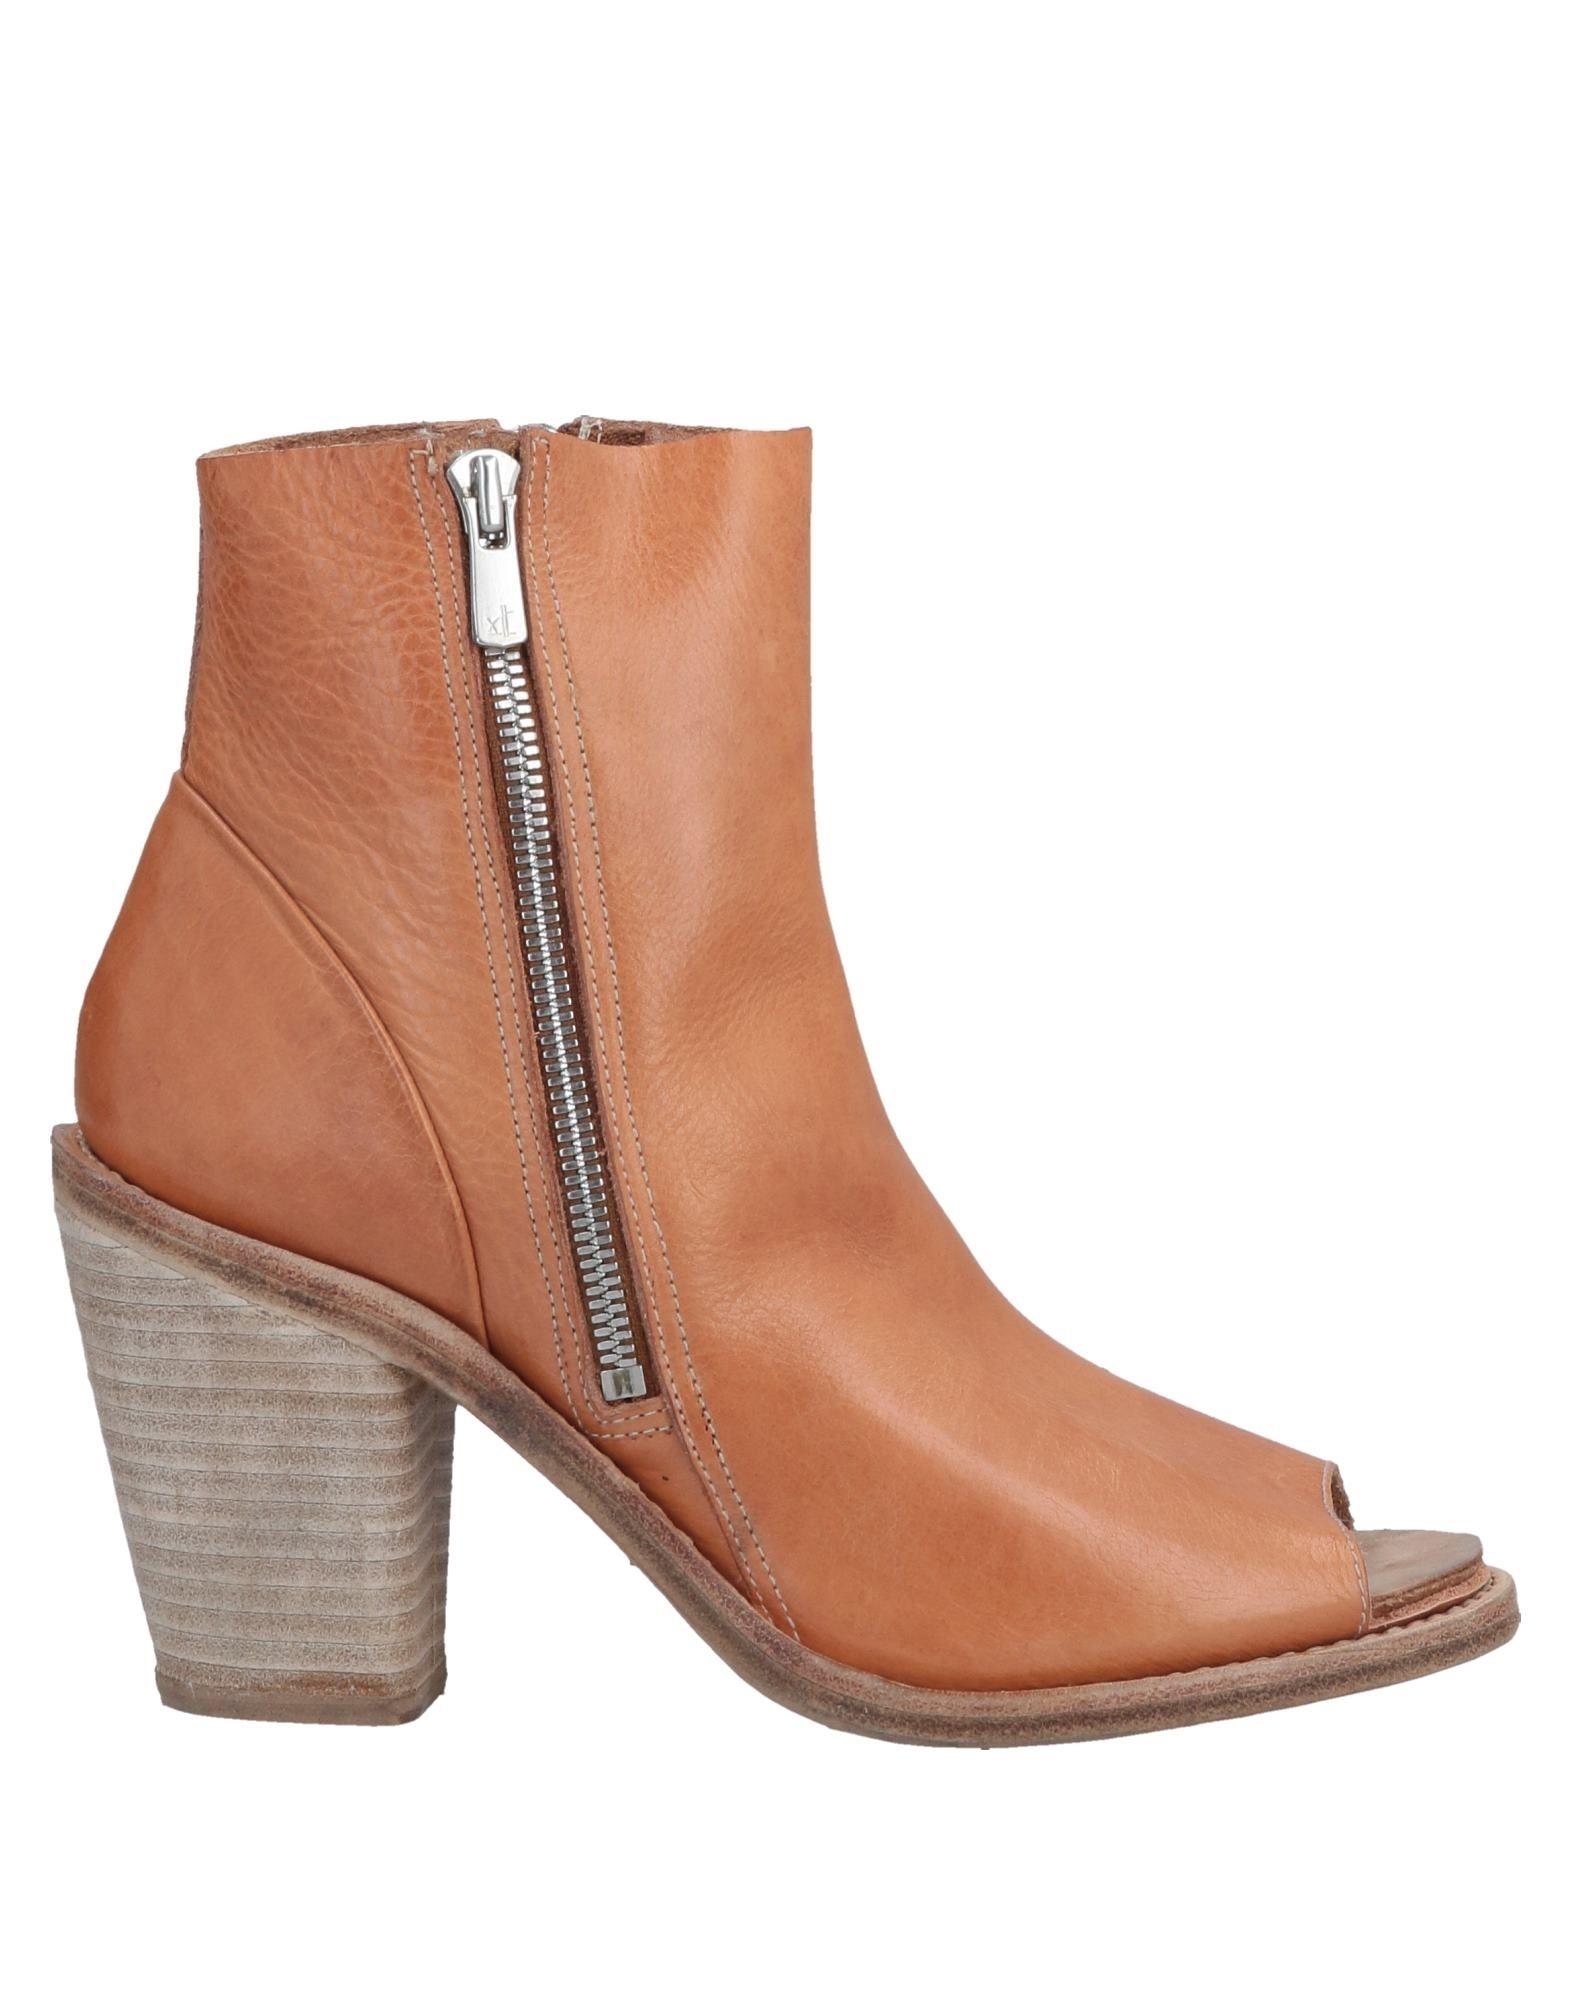 PREMIATA Полусапоги и высокие ботинки premiata полусапоги и высокие ботинки